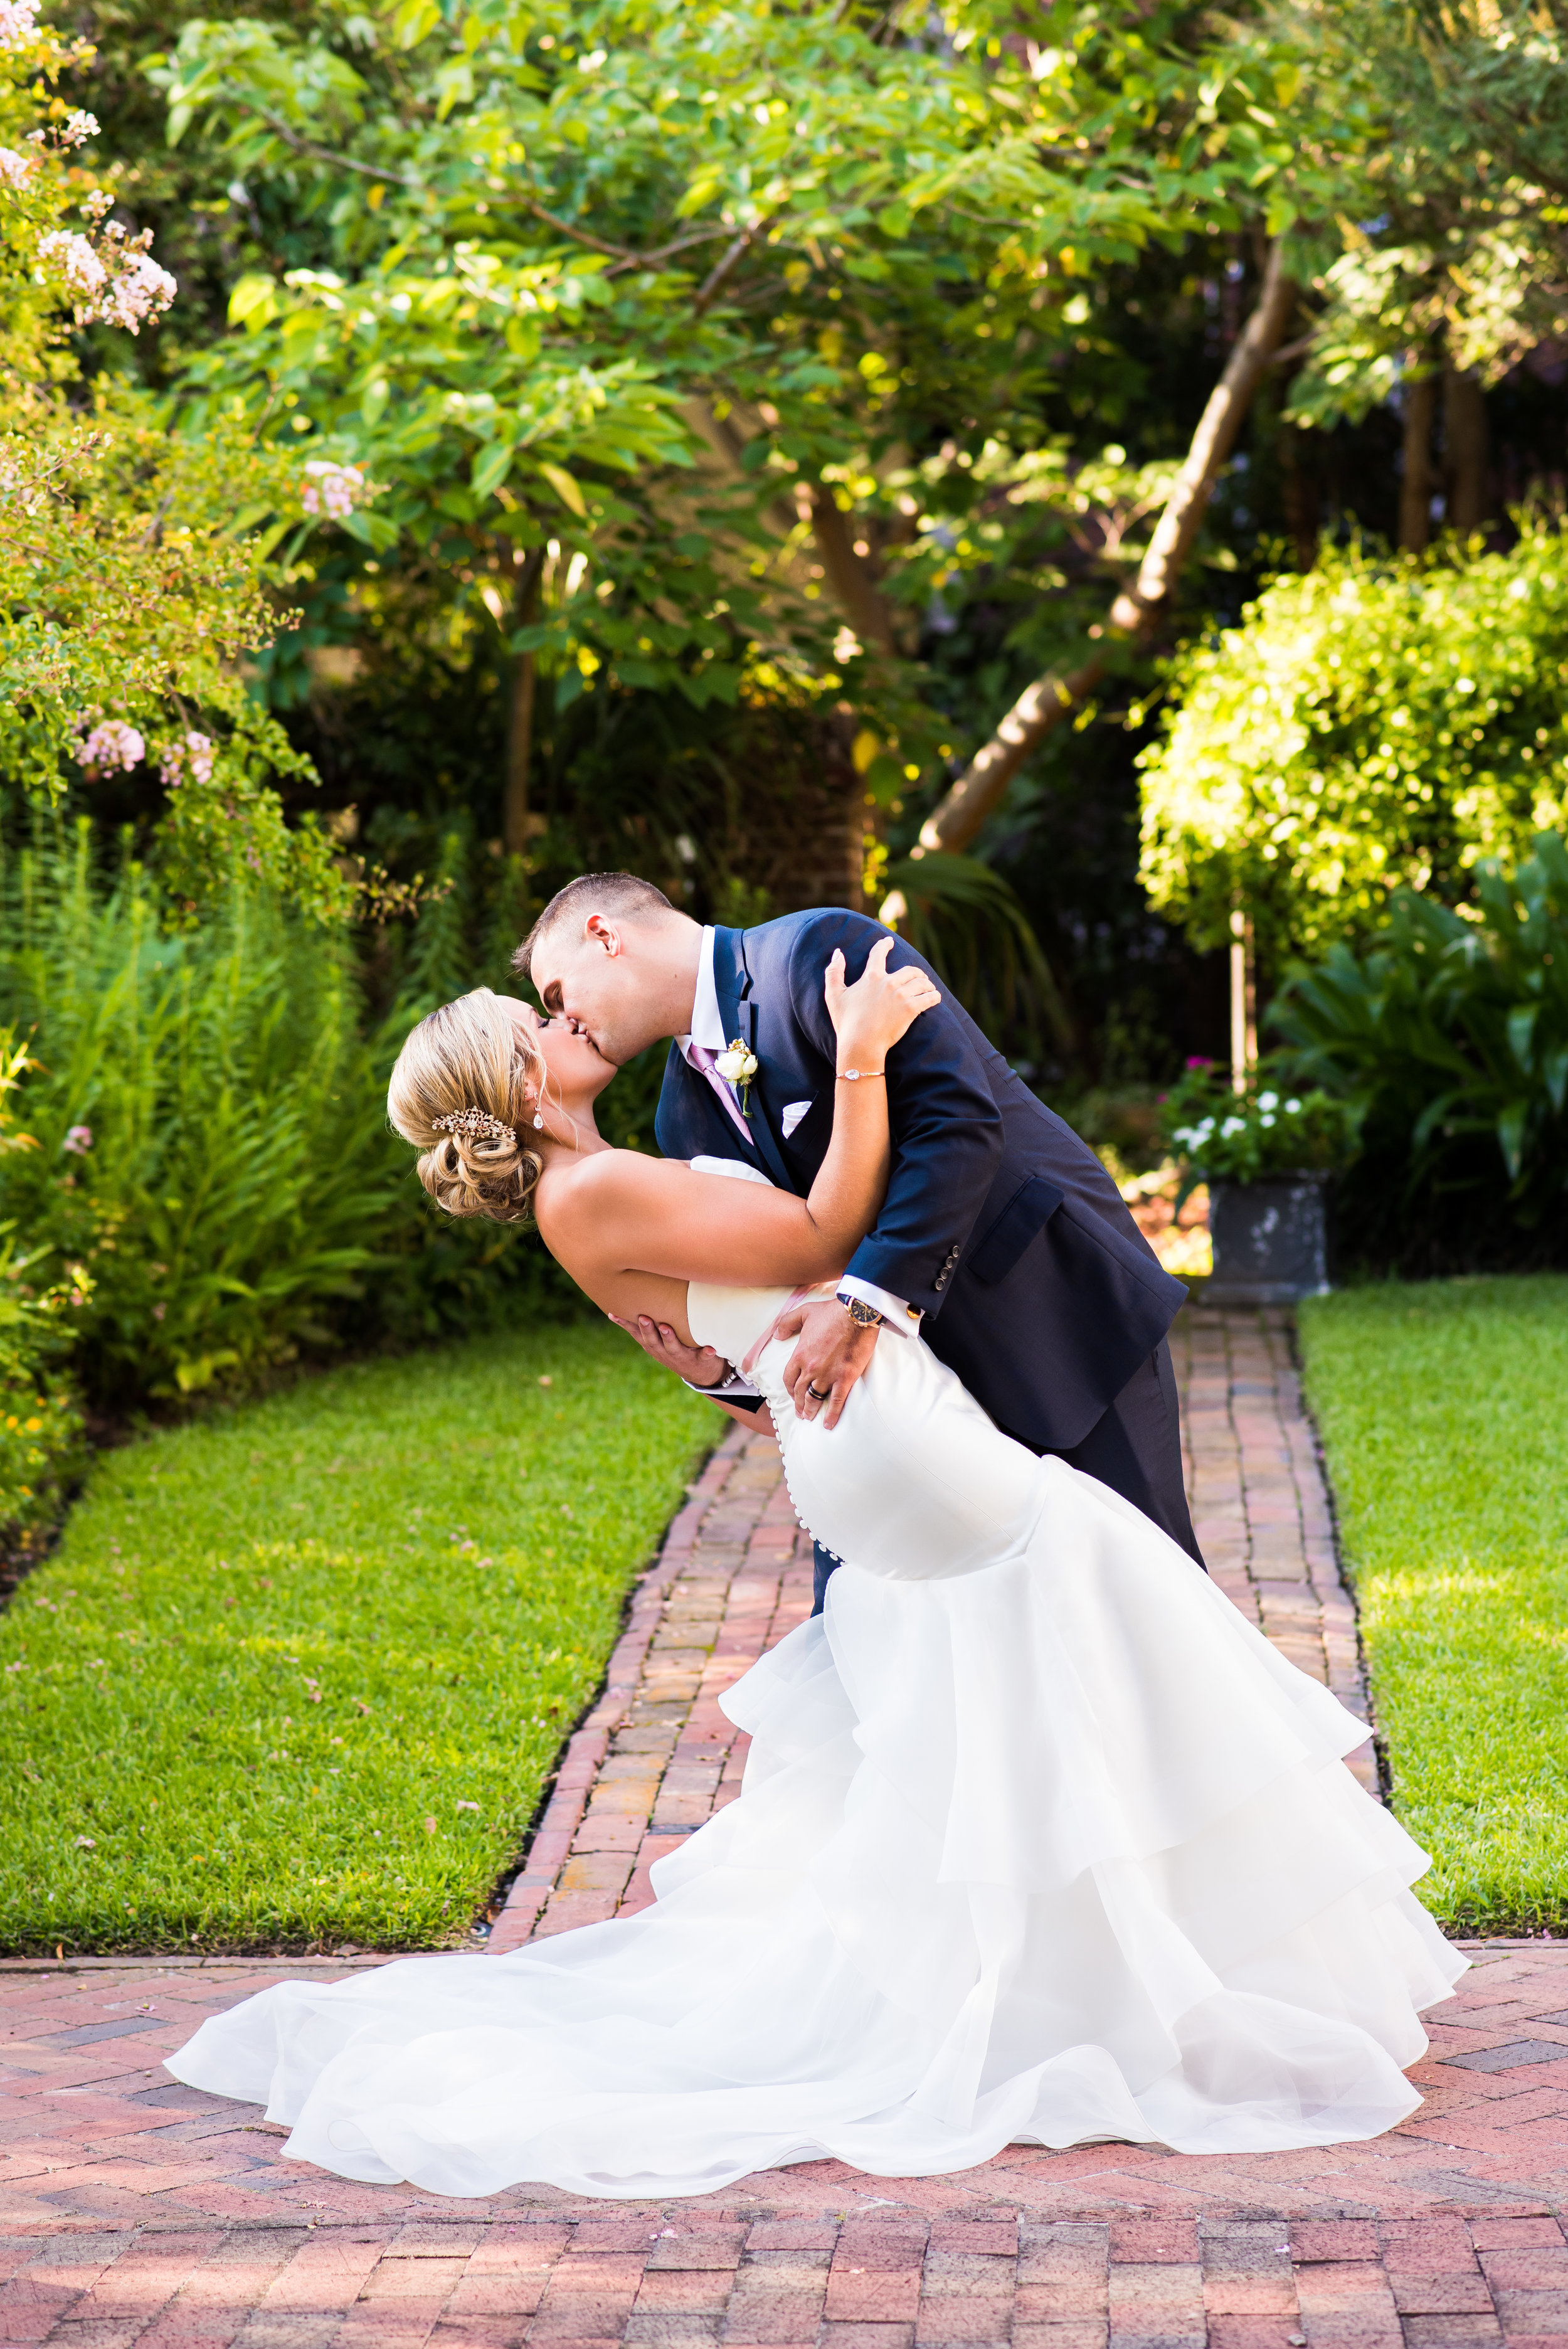 Tamryn & Shane O'Toole Wedding Collection_255.jpg